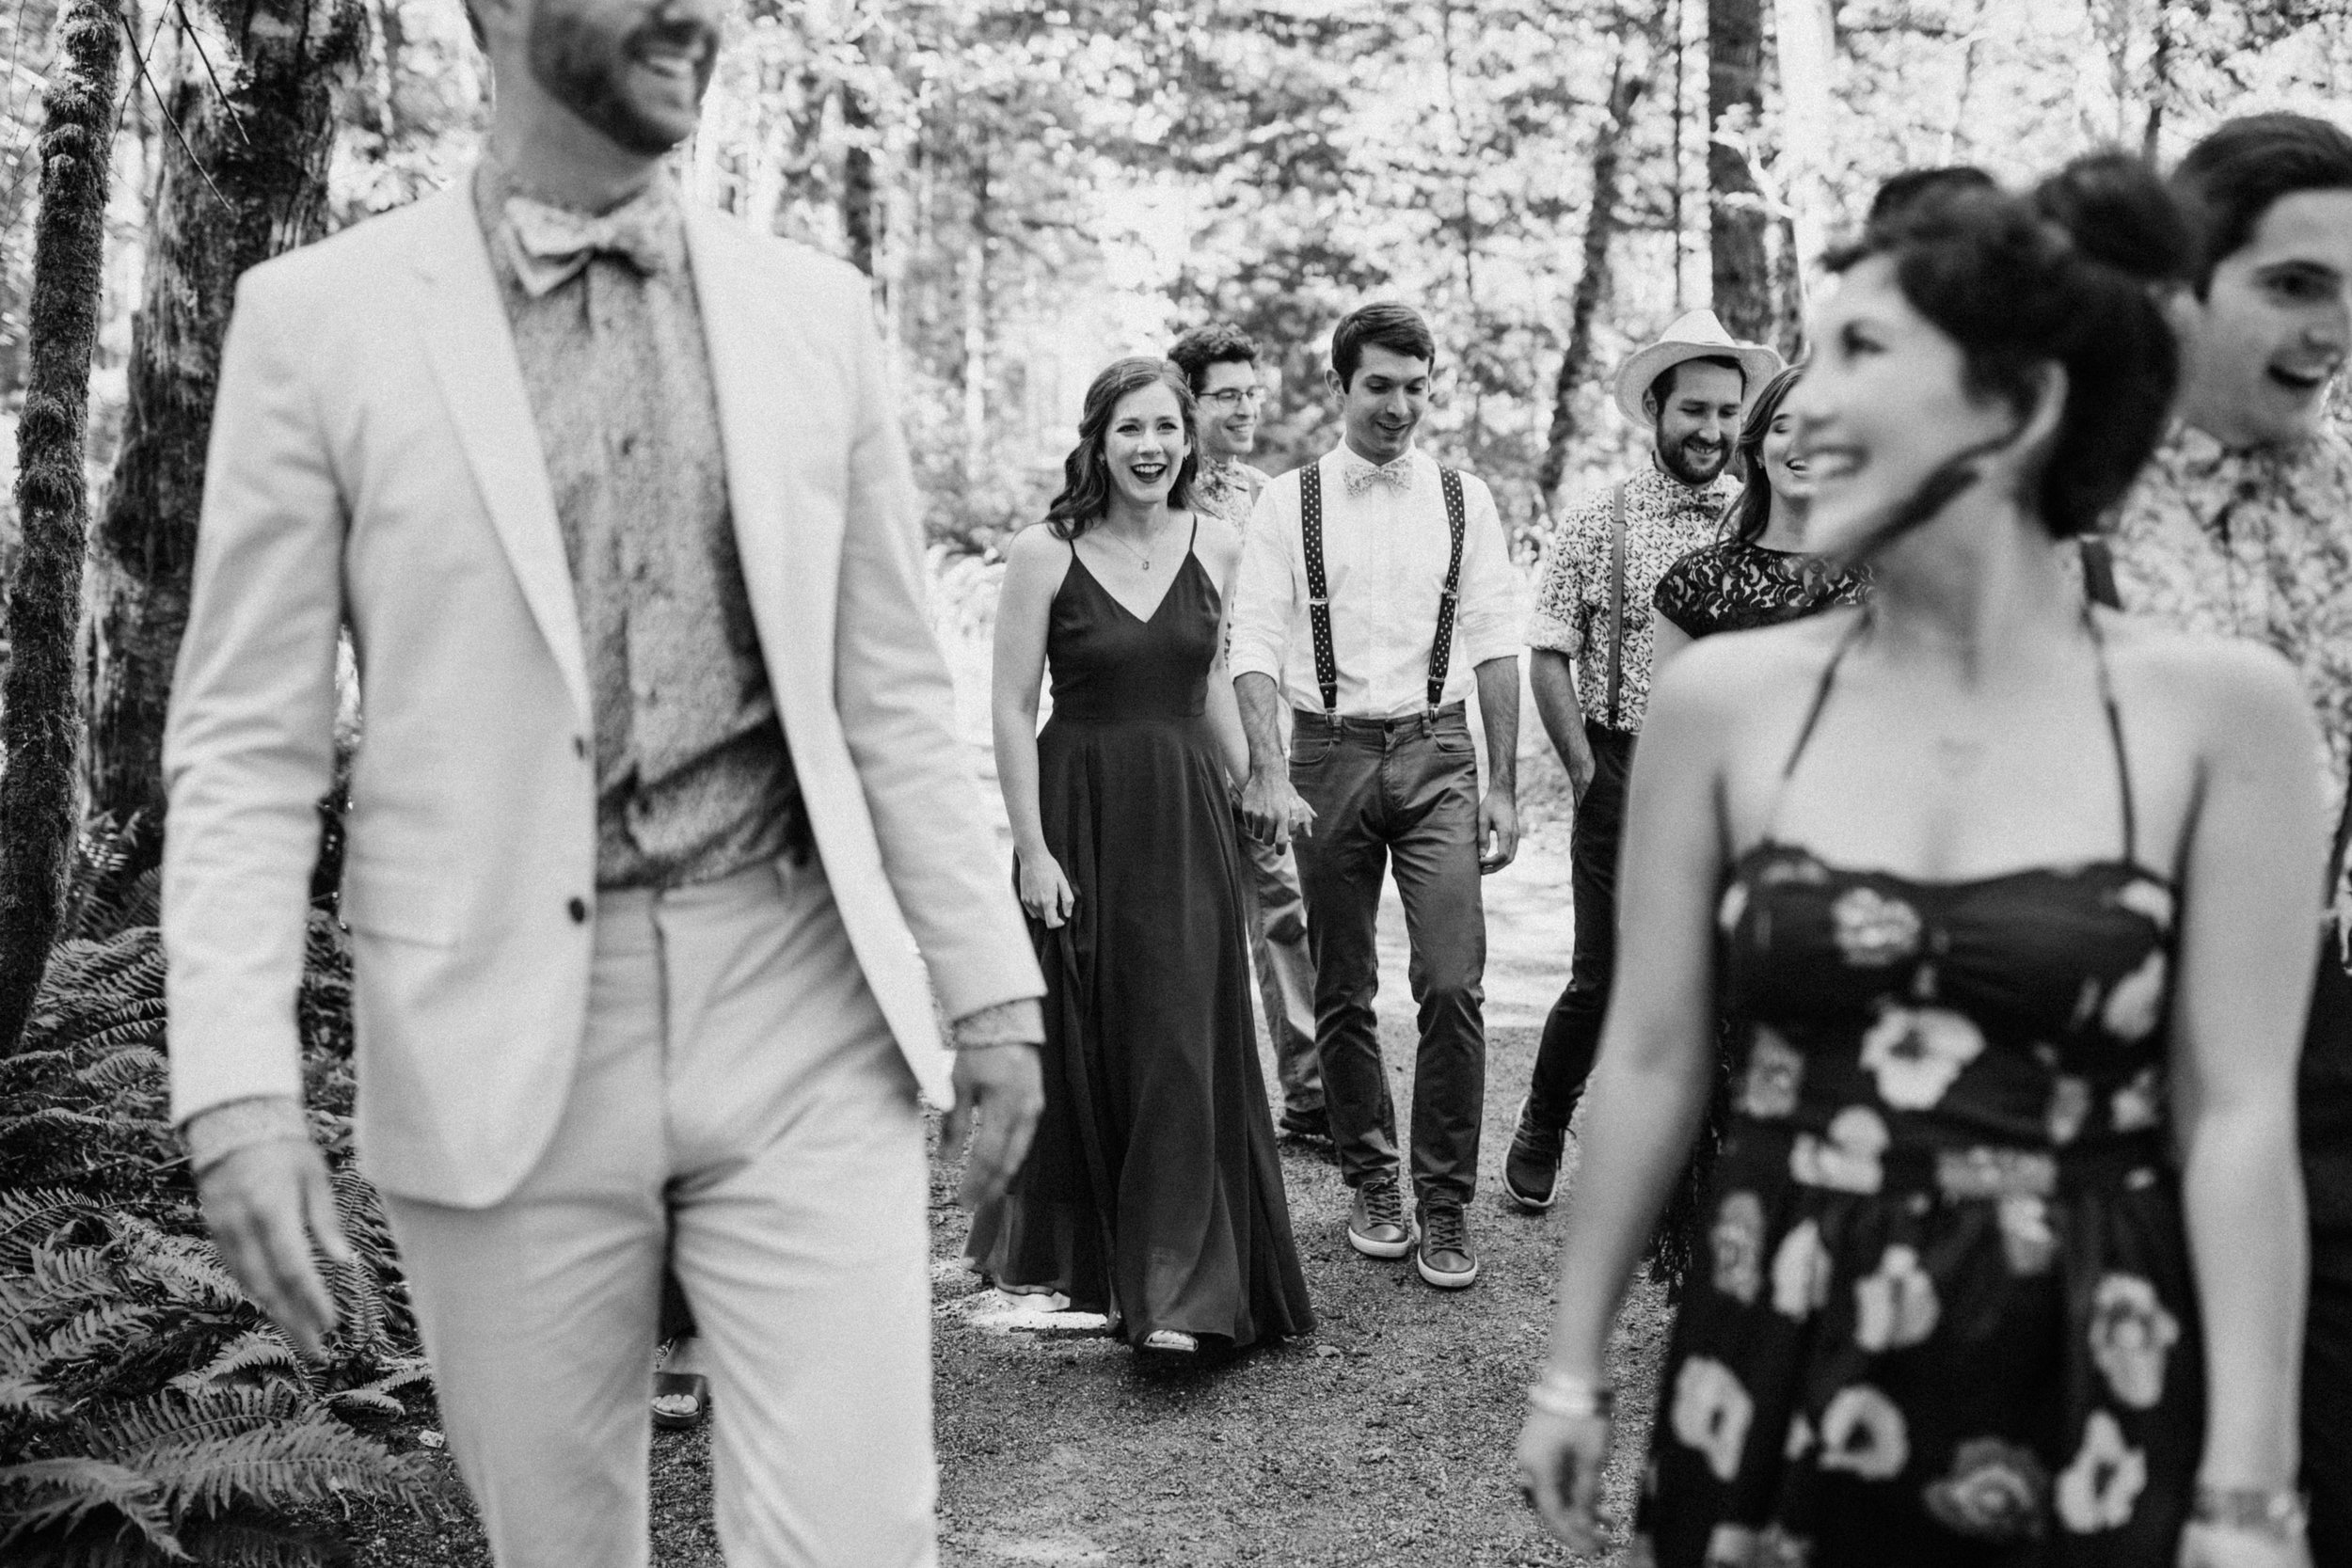 Bridal party walks through woods